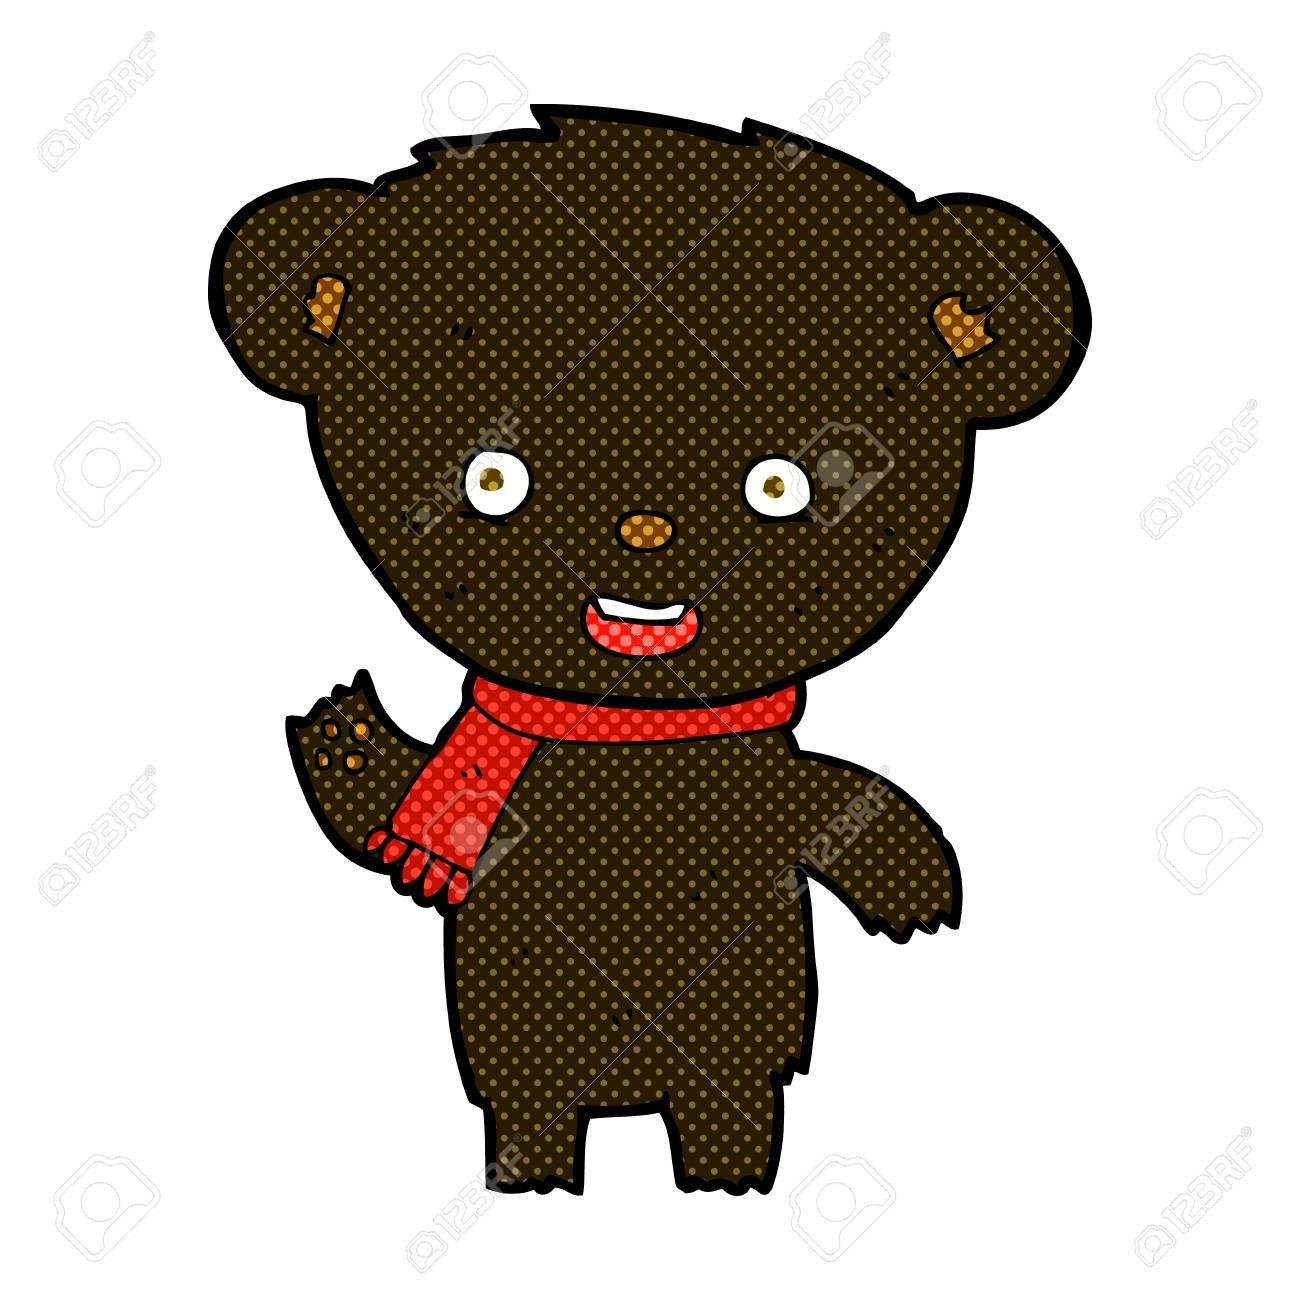 92415af1975db Retro comic book style cartoon cute black bear royalty free cliparts jpg  1300x1300 Retro bear